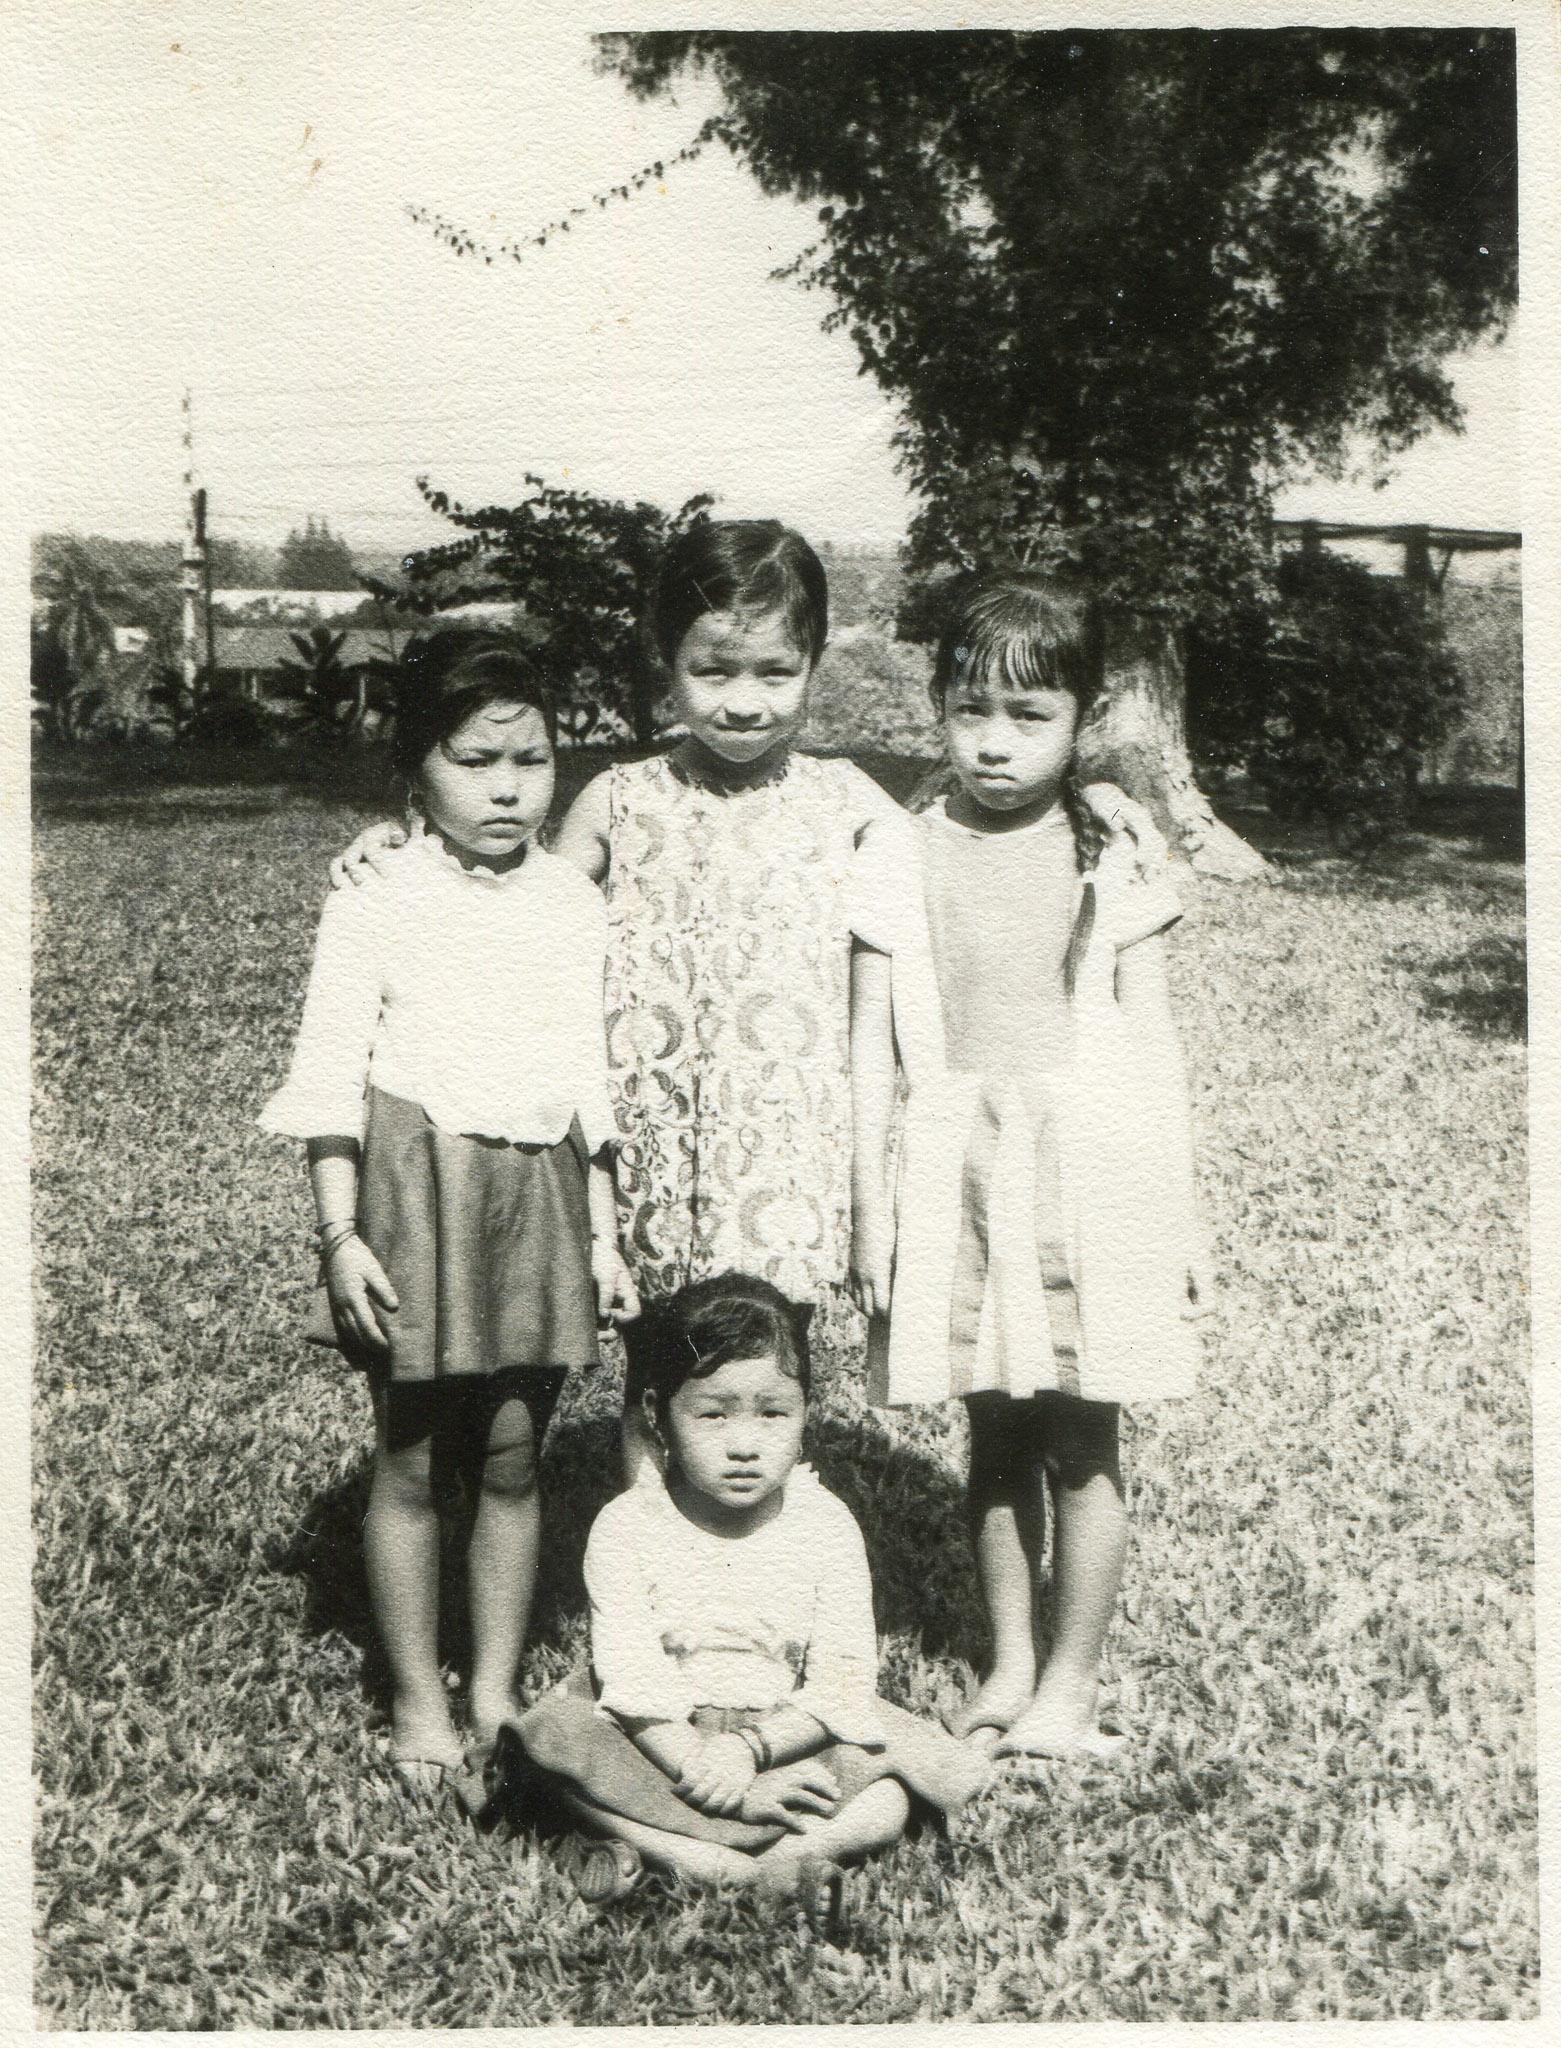 singapore-gurkhas-archive-photo-museum-zakaria-zainal-8.jpg